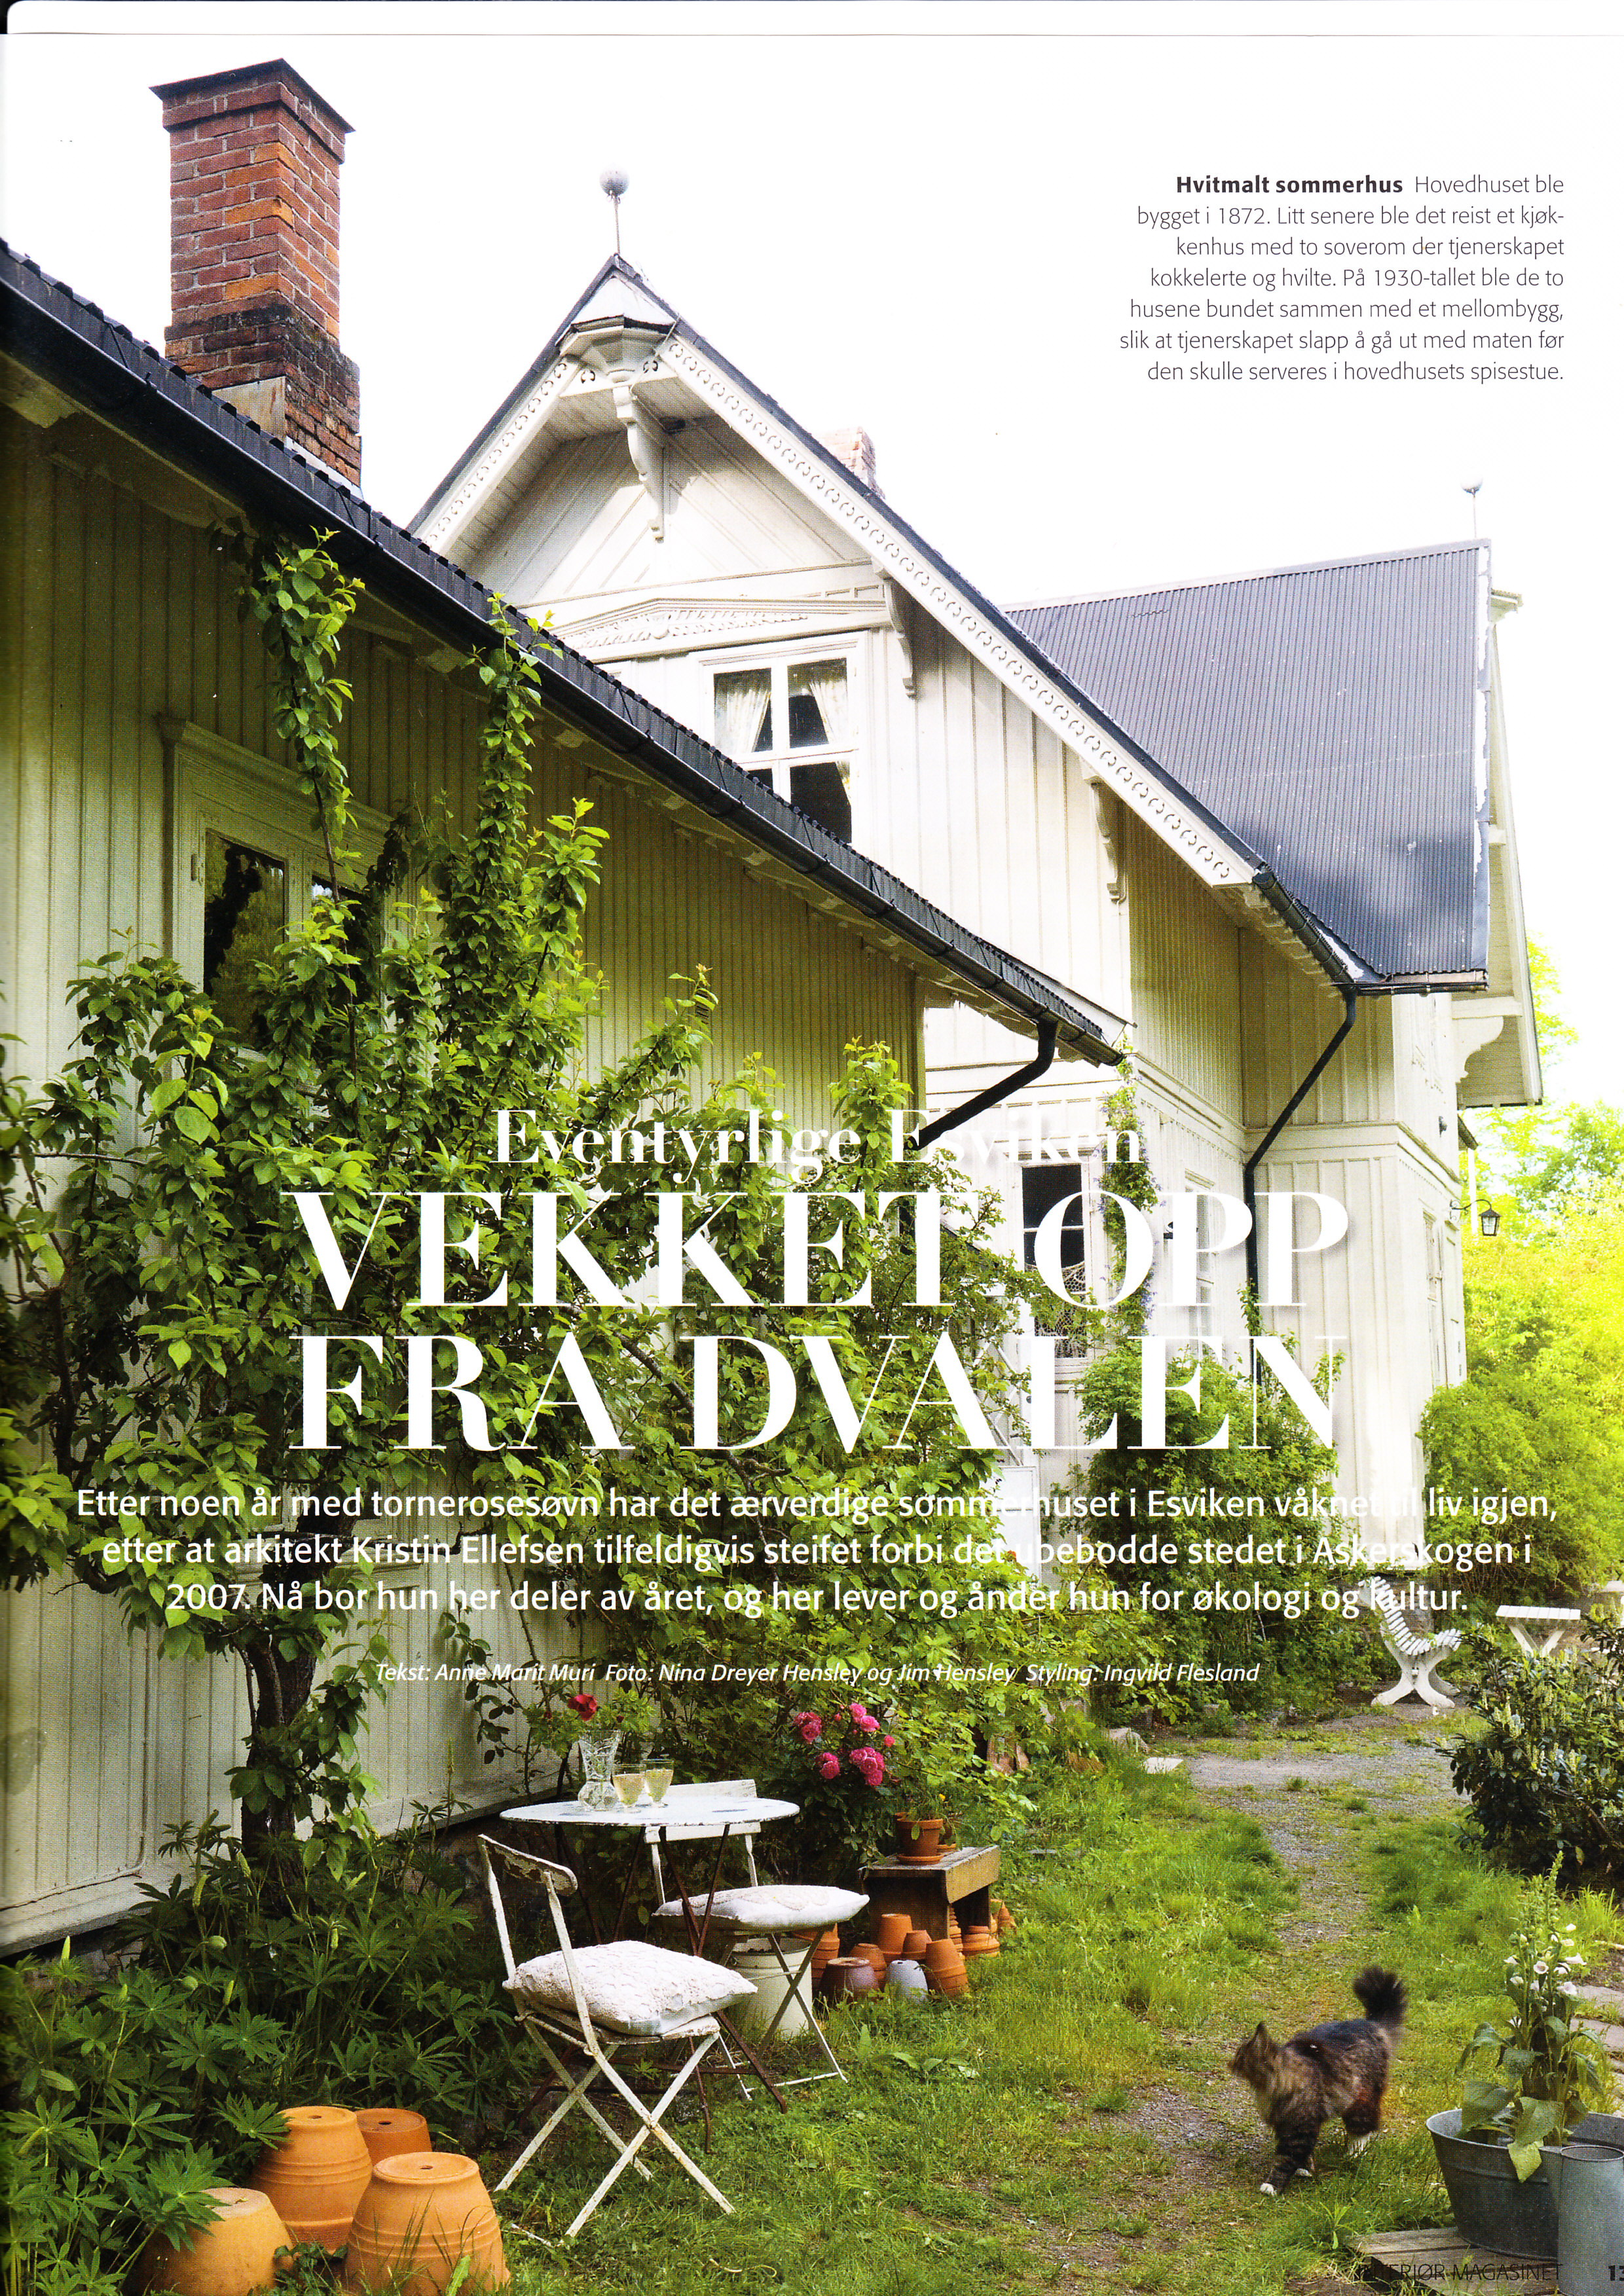 - Artikkel Interiørmagasinet om min virksomhet (STILLSCAPE) i Esviken i Asker 2009